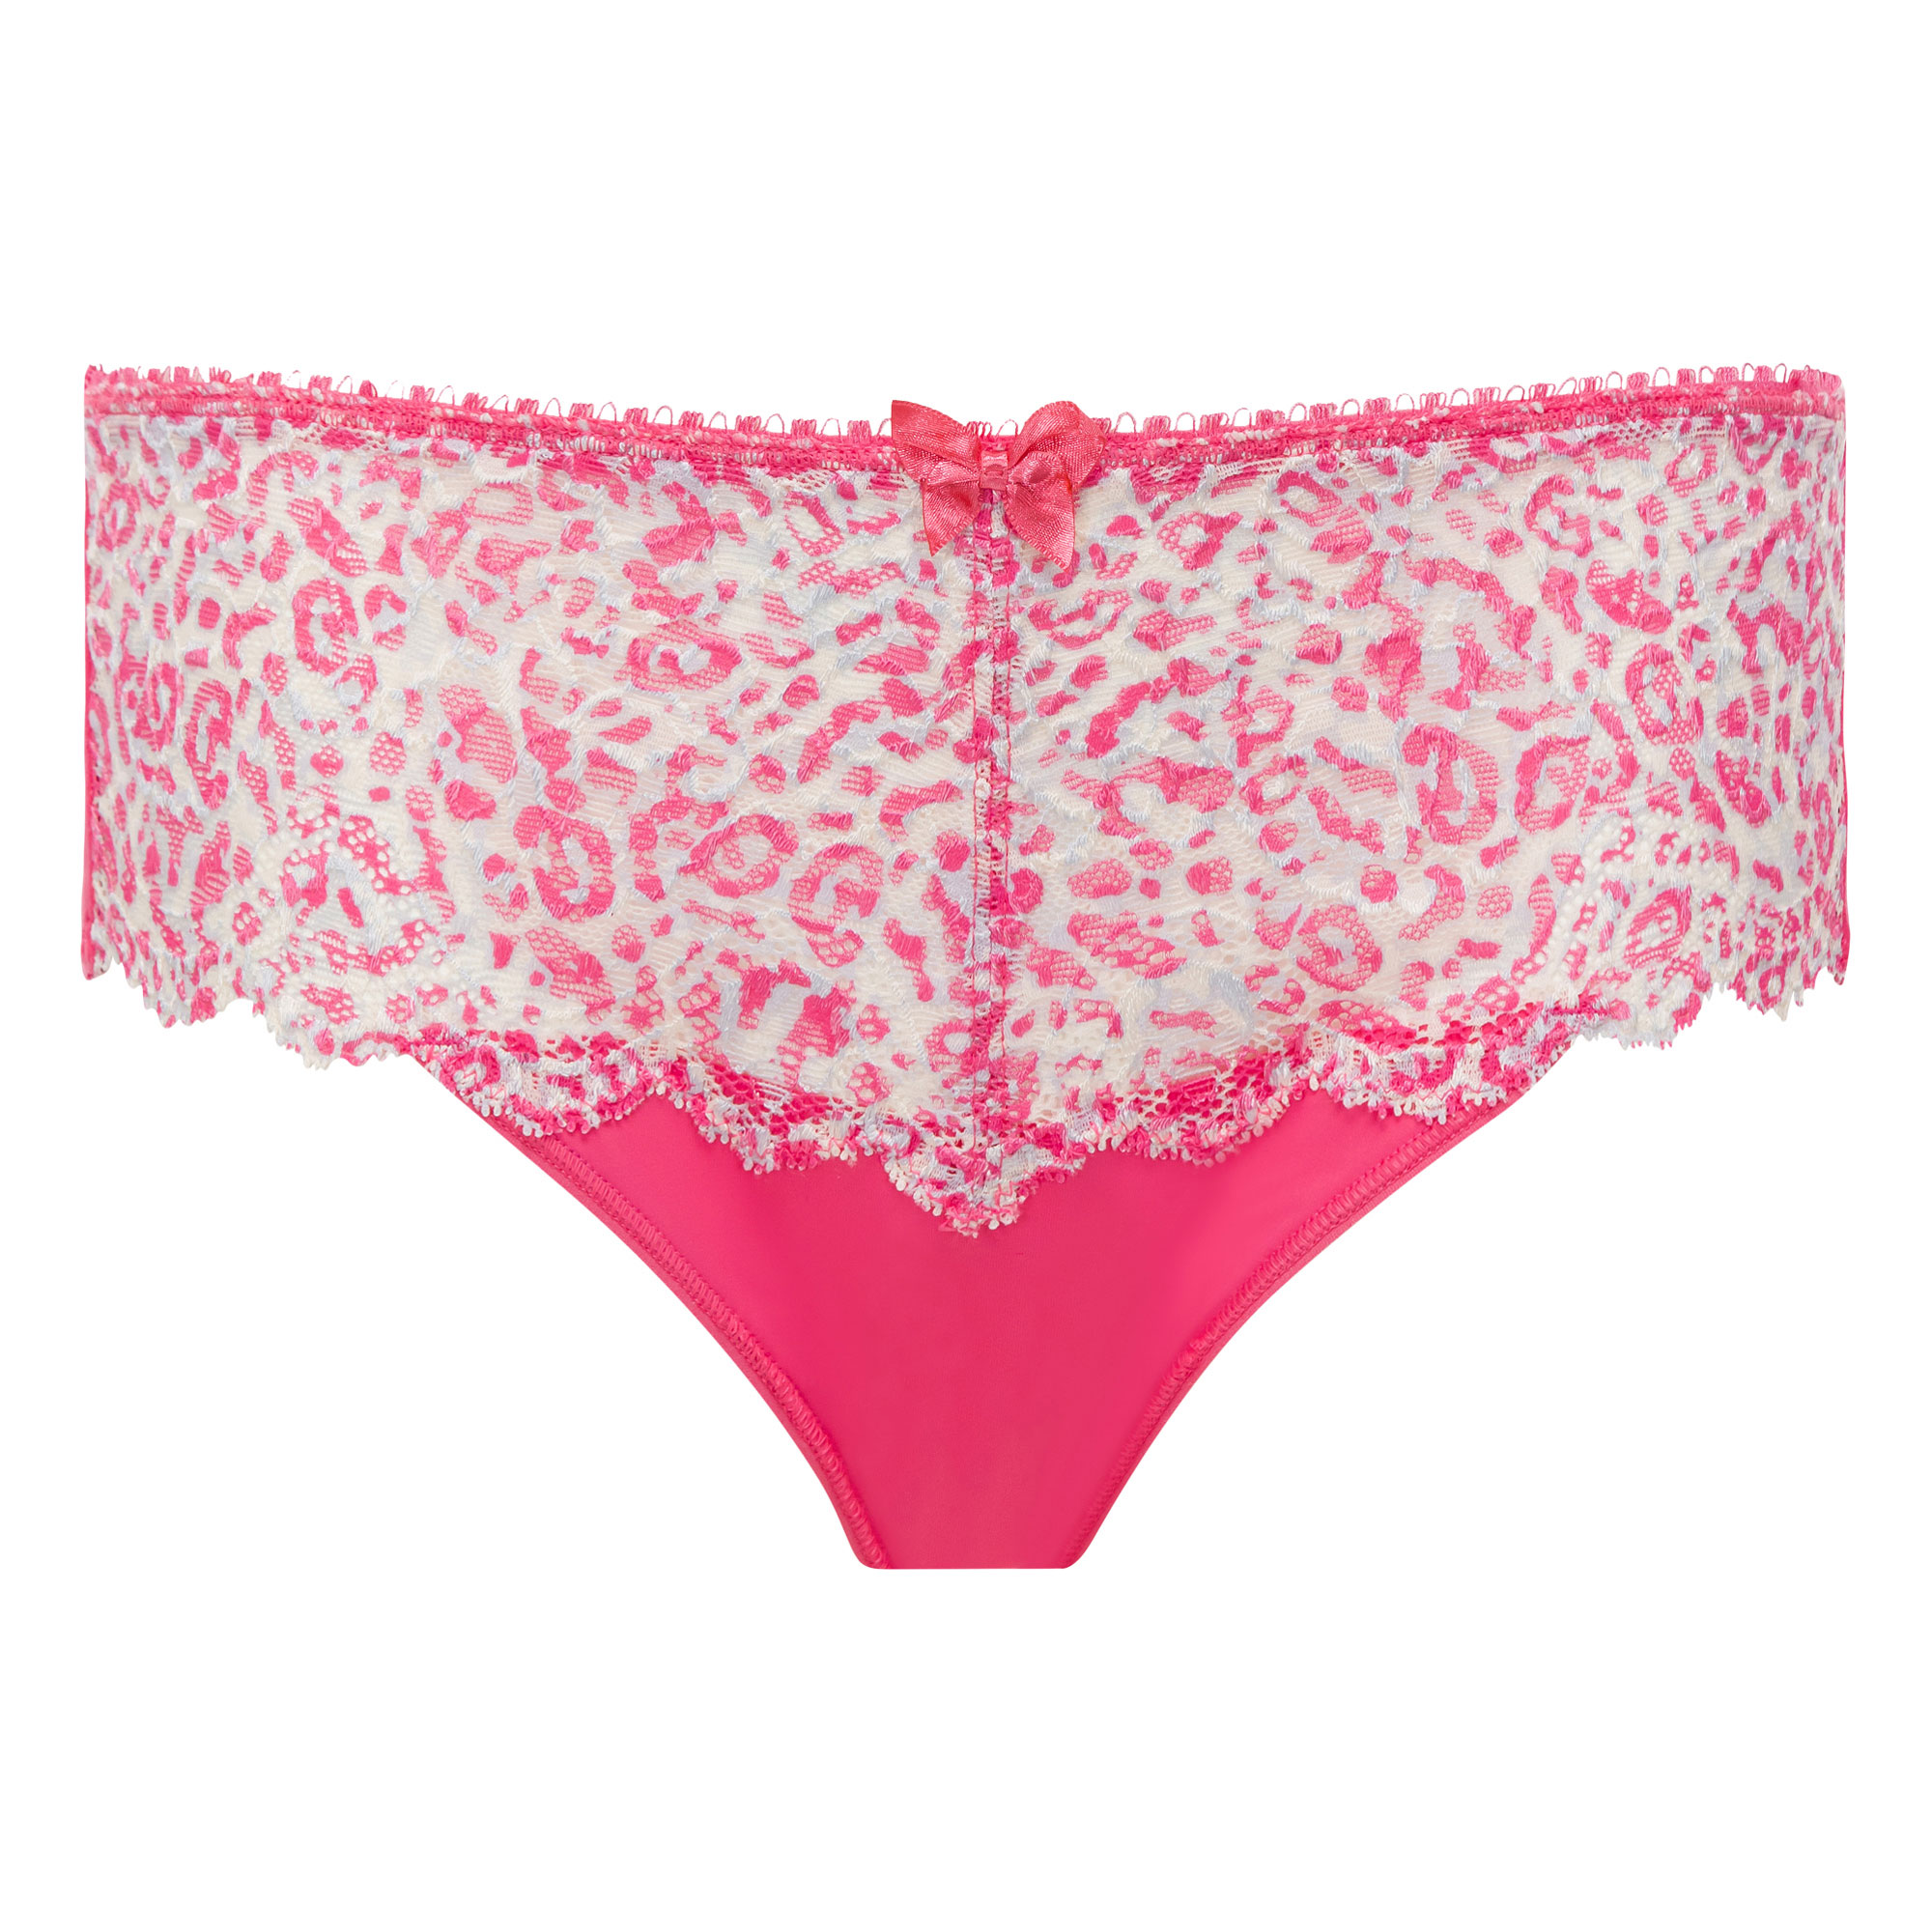 Culotte Midi imprimé rose éclatant - Flower Elegance-PLAYTEX